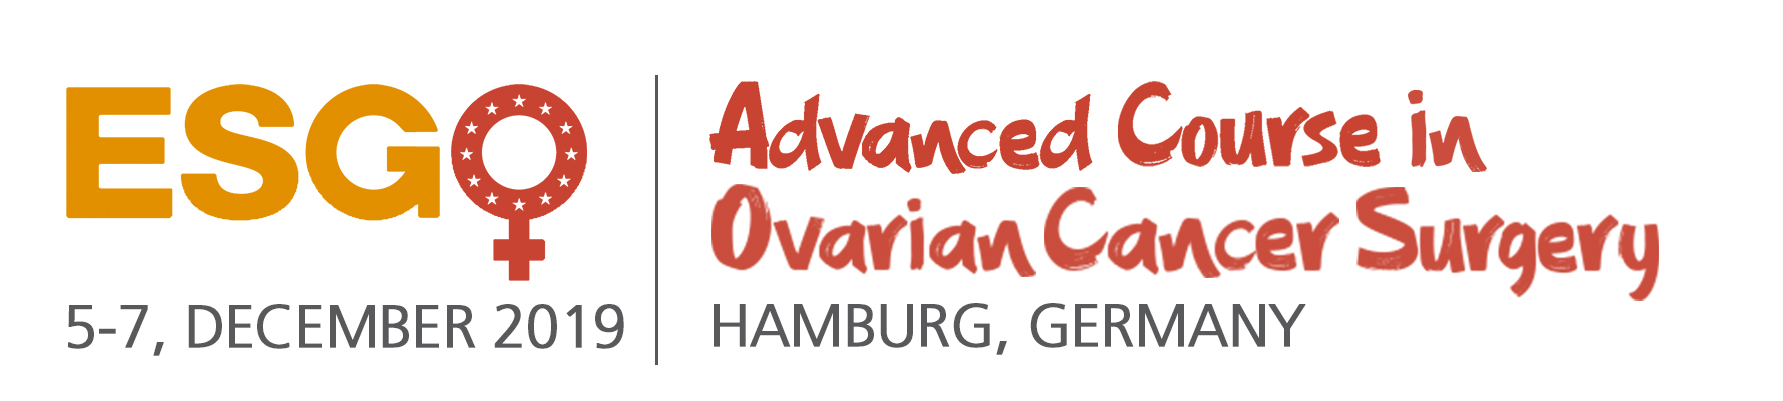 OC Course 2019 Banner_v1